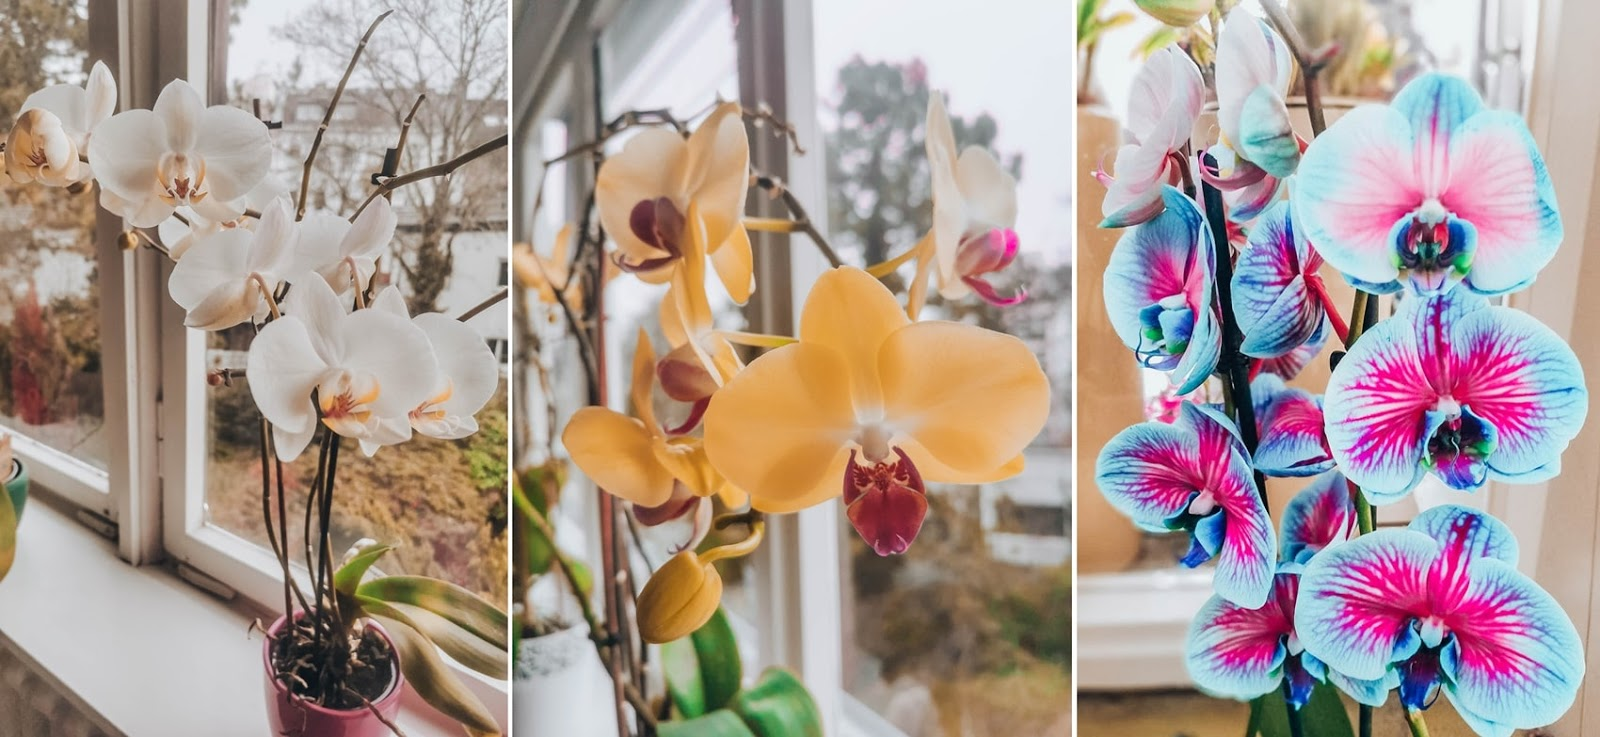 orchidea_storczyk